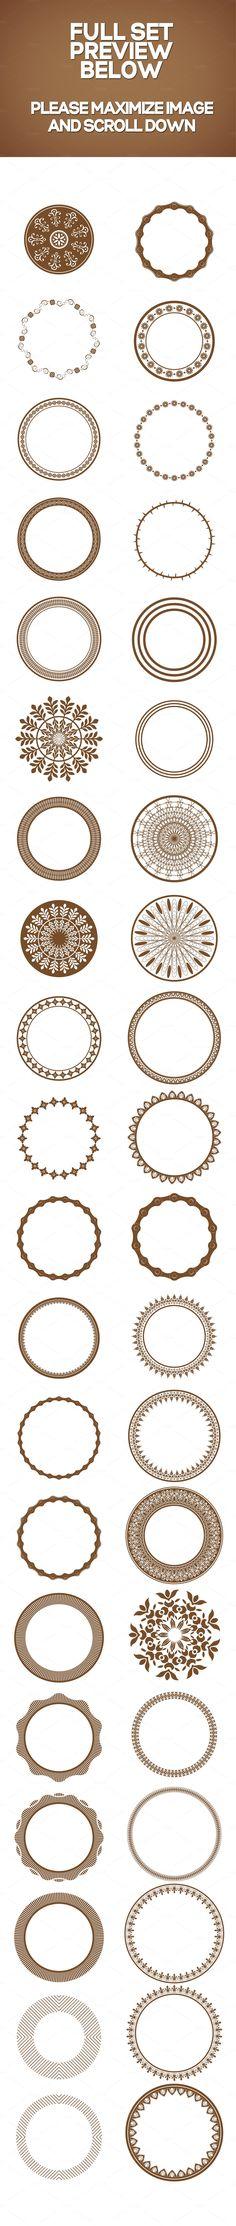 40 Circular Shapes - Vector - Vol. 4 - Objects - 5